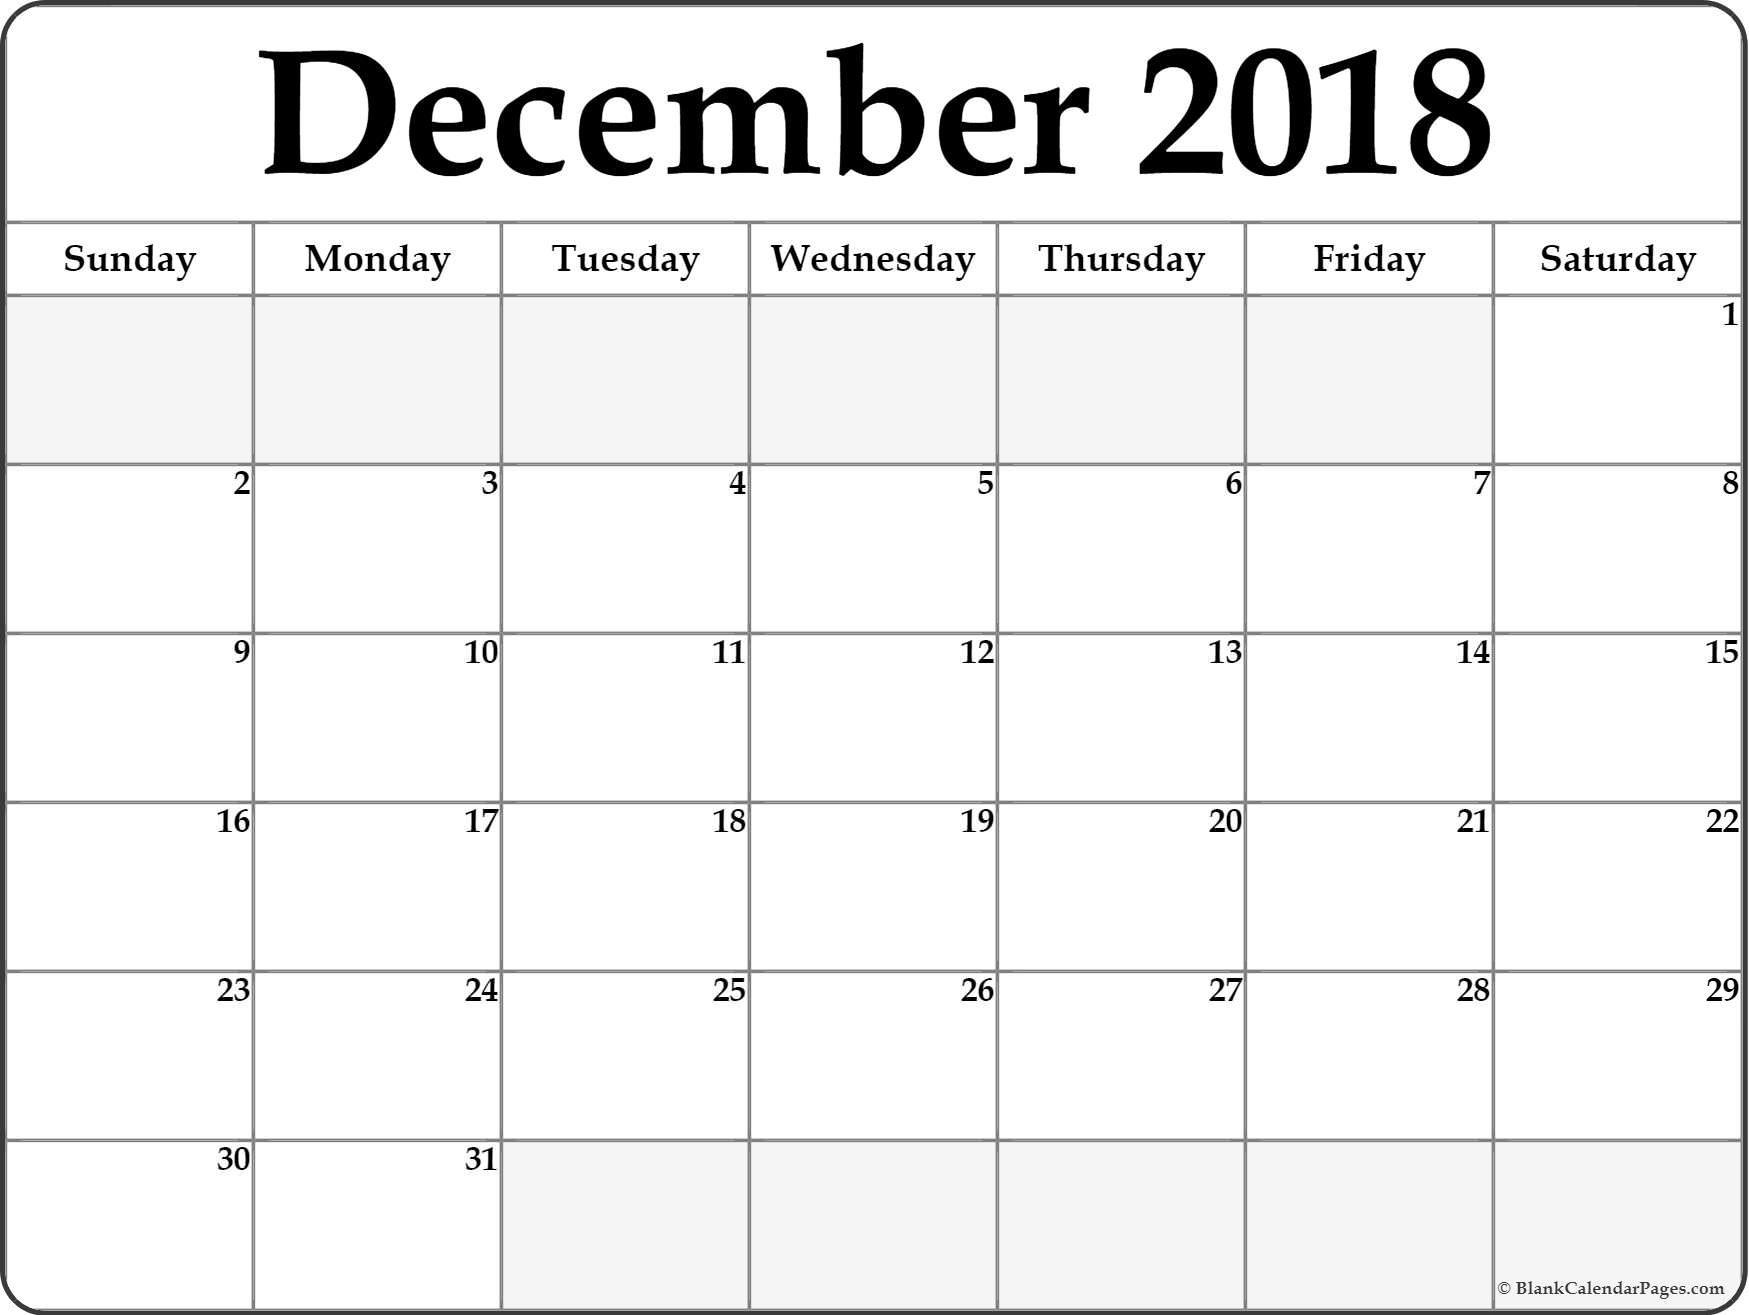 December 2018 Blank Calendar December 2018 Calendar Printable